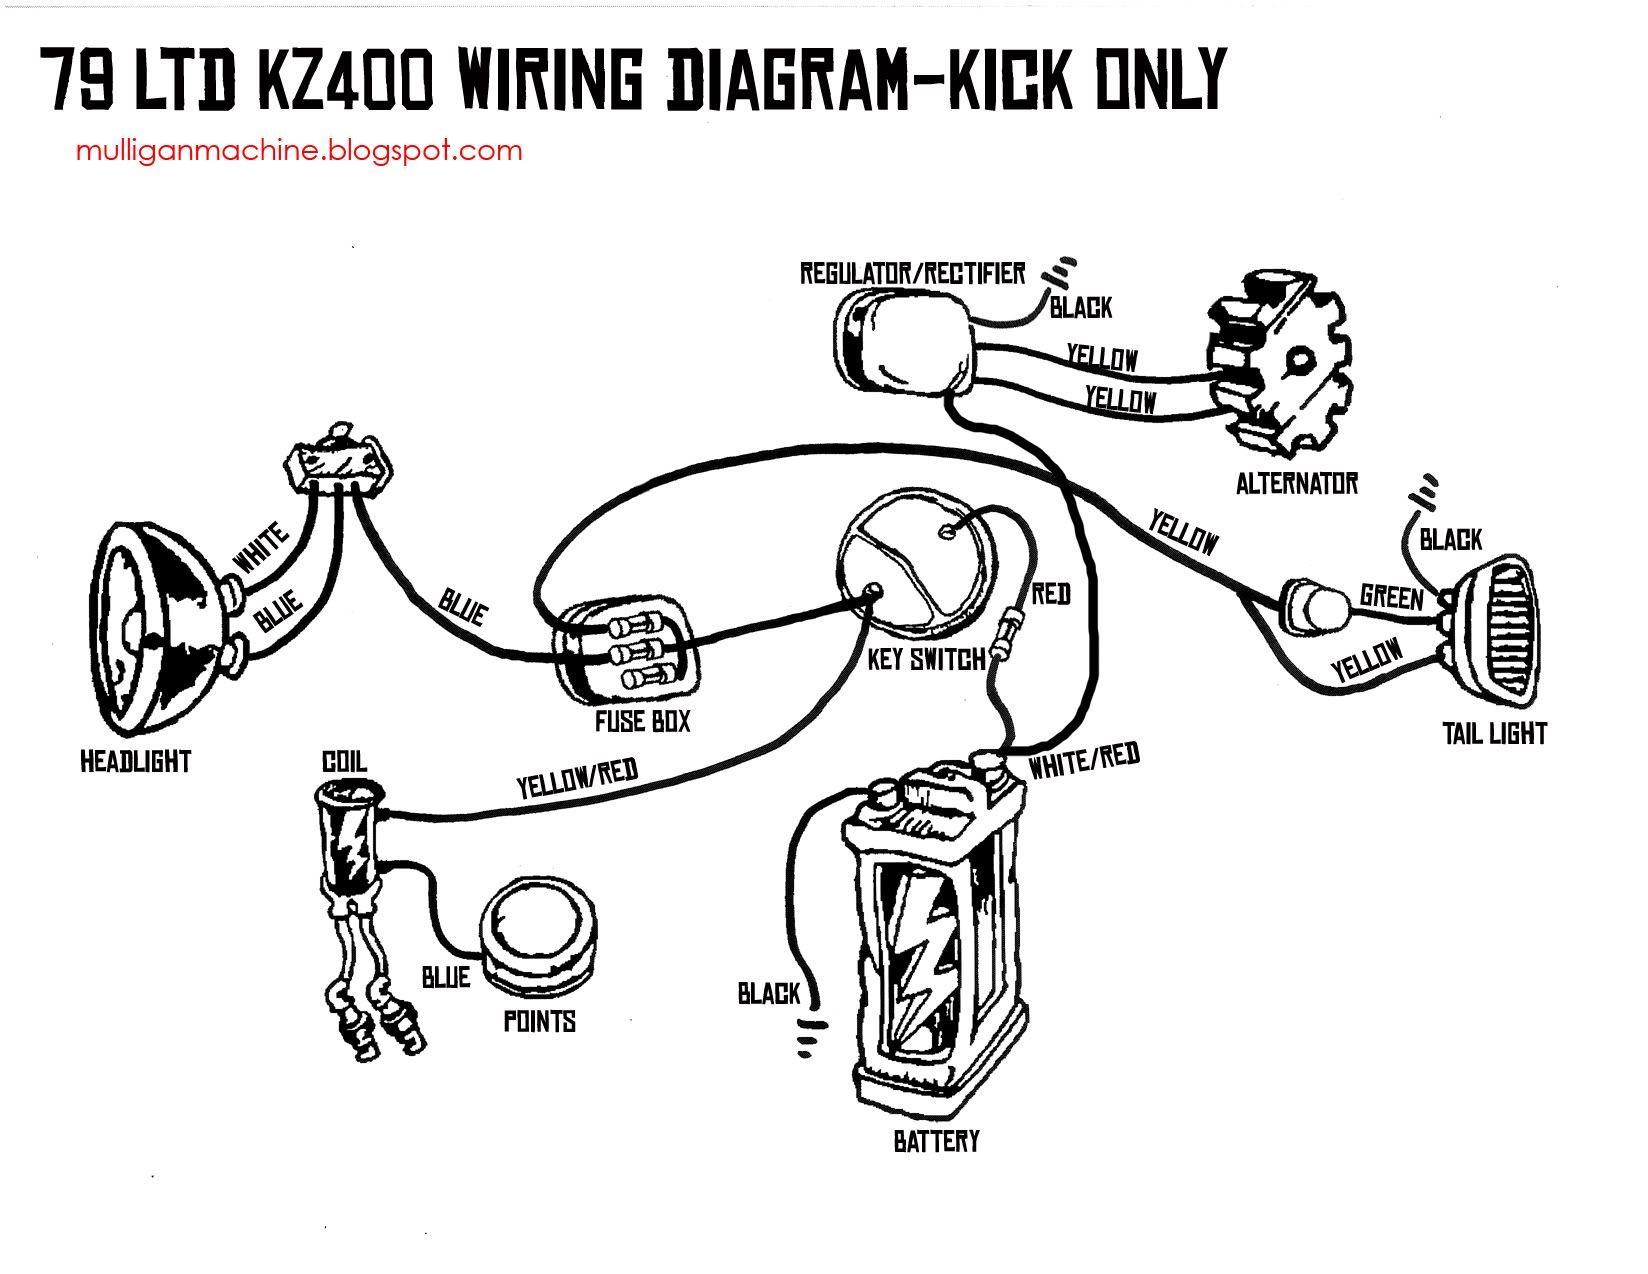 Enchanting 1975 honda cb750 wiring diagram pictures best image enchanting 1982 honda cb750 wiring diagram contemporary best sciox Gallery